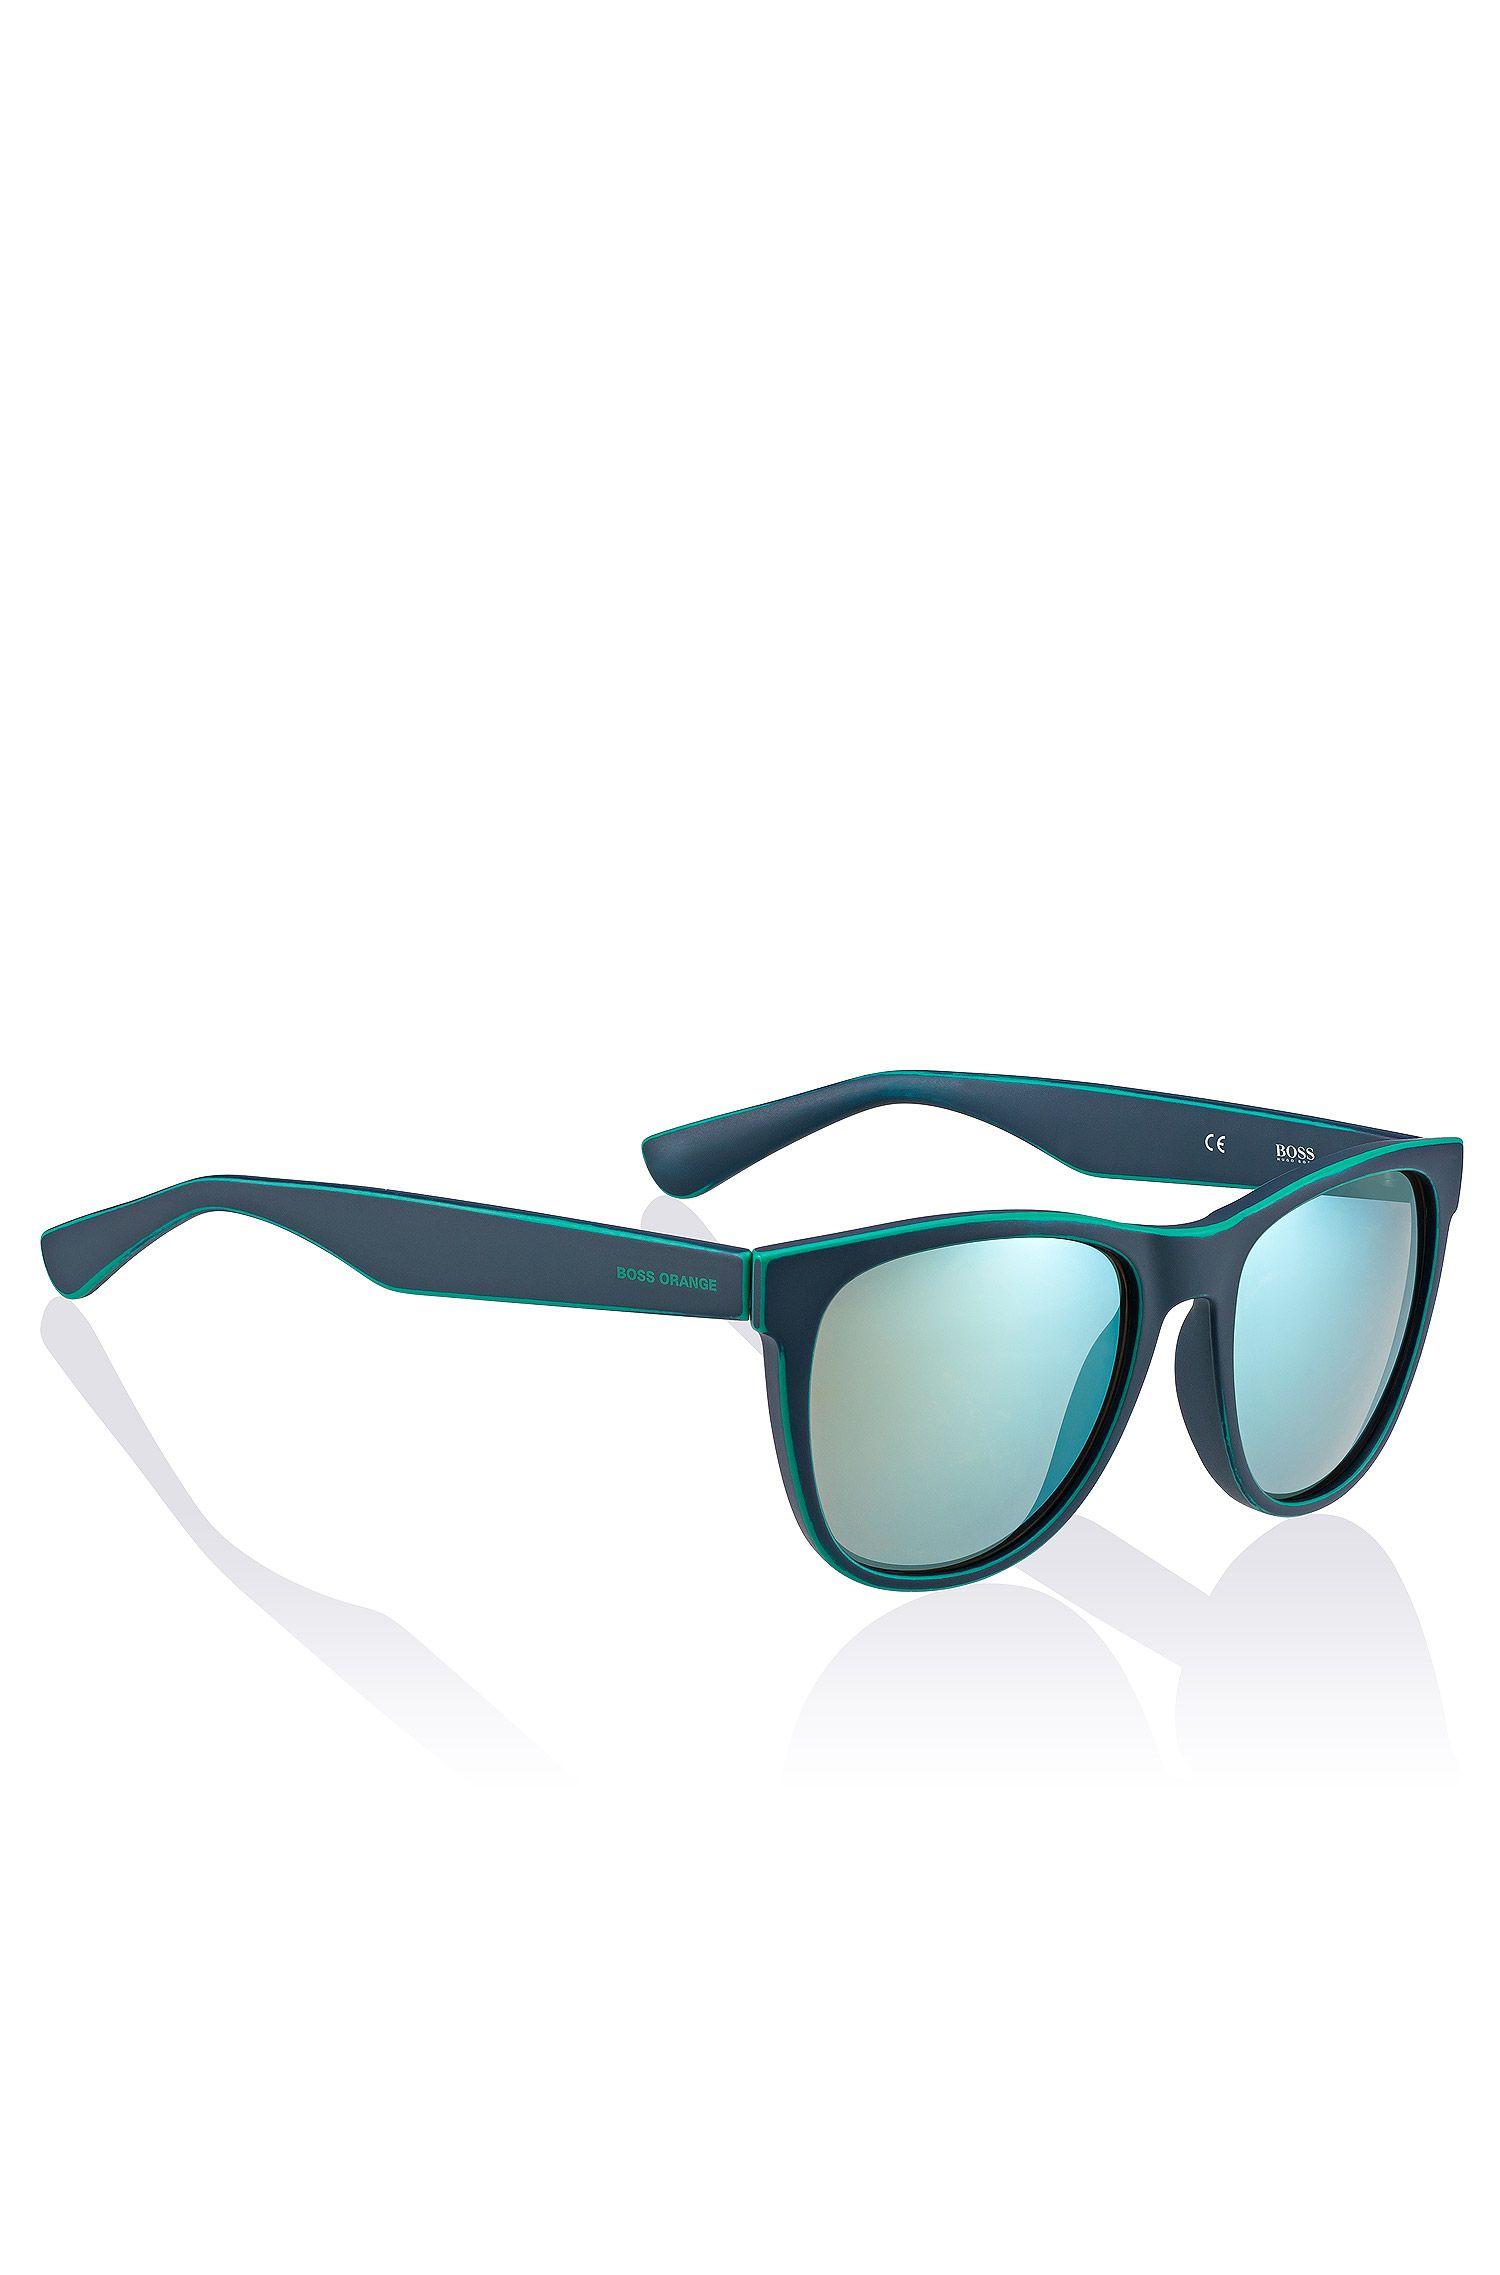 Wayfarer-Sonnenbrille ´BO 0198` aus Acetat